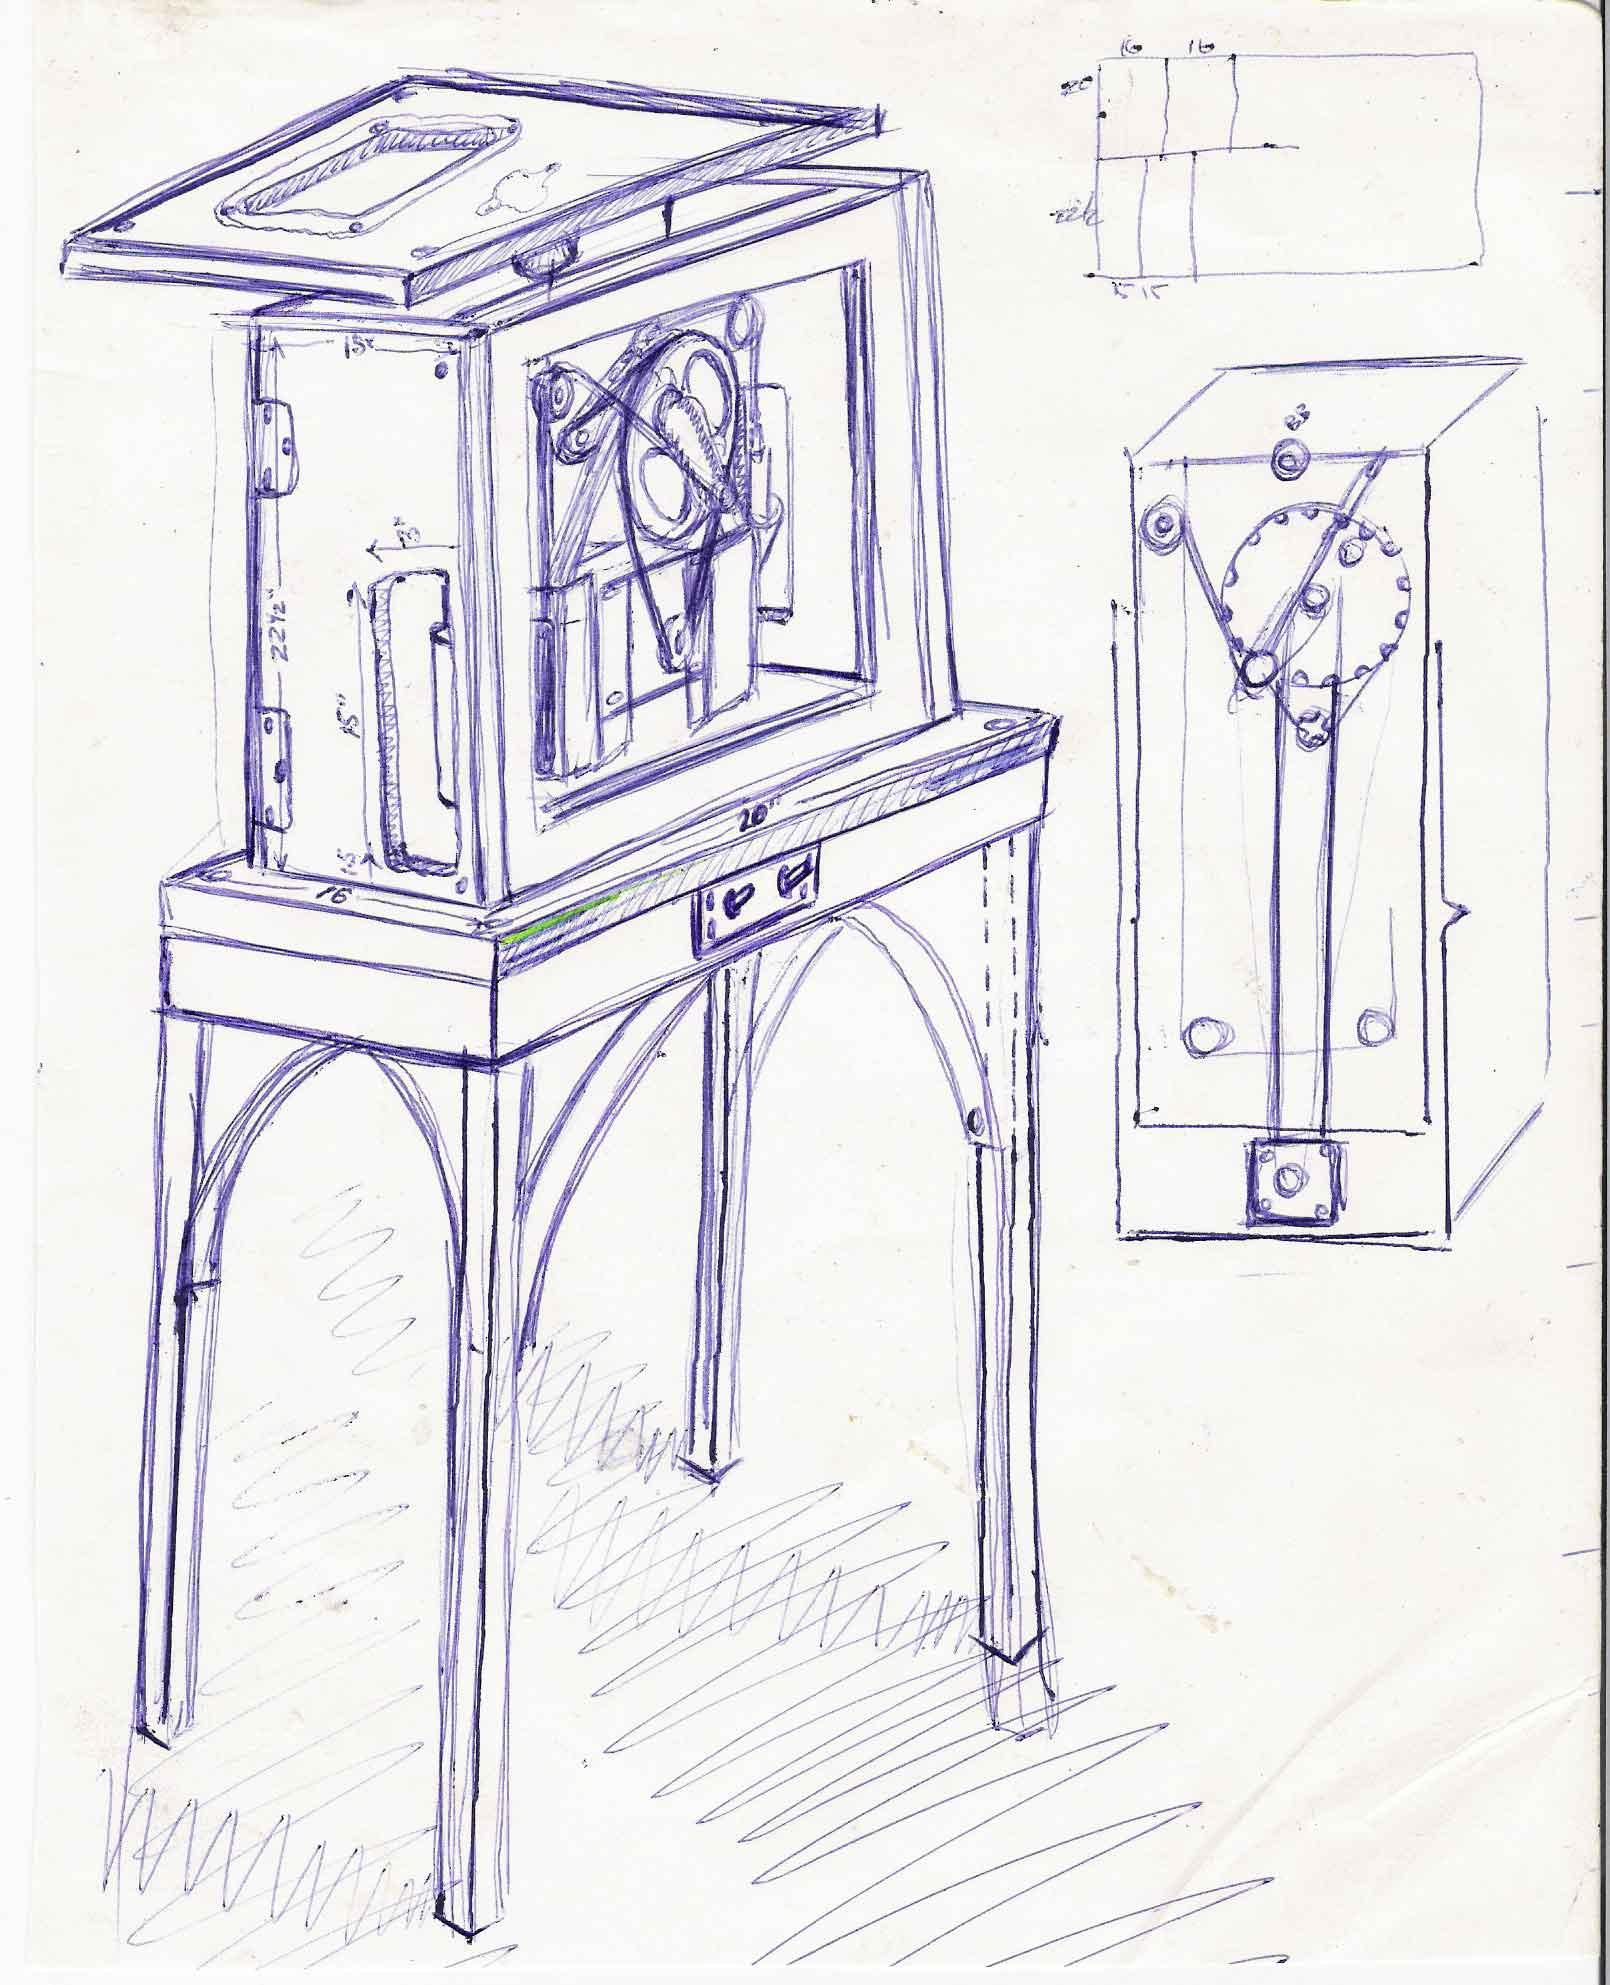 sketch-20-sept-05.jpg